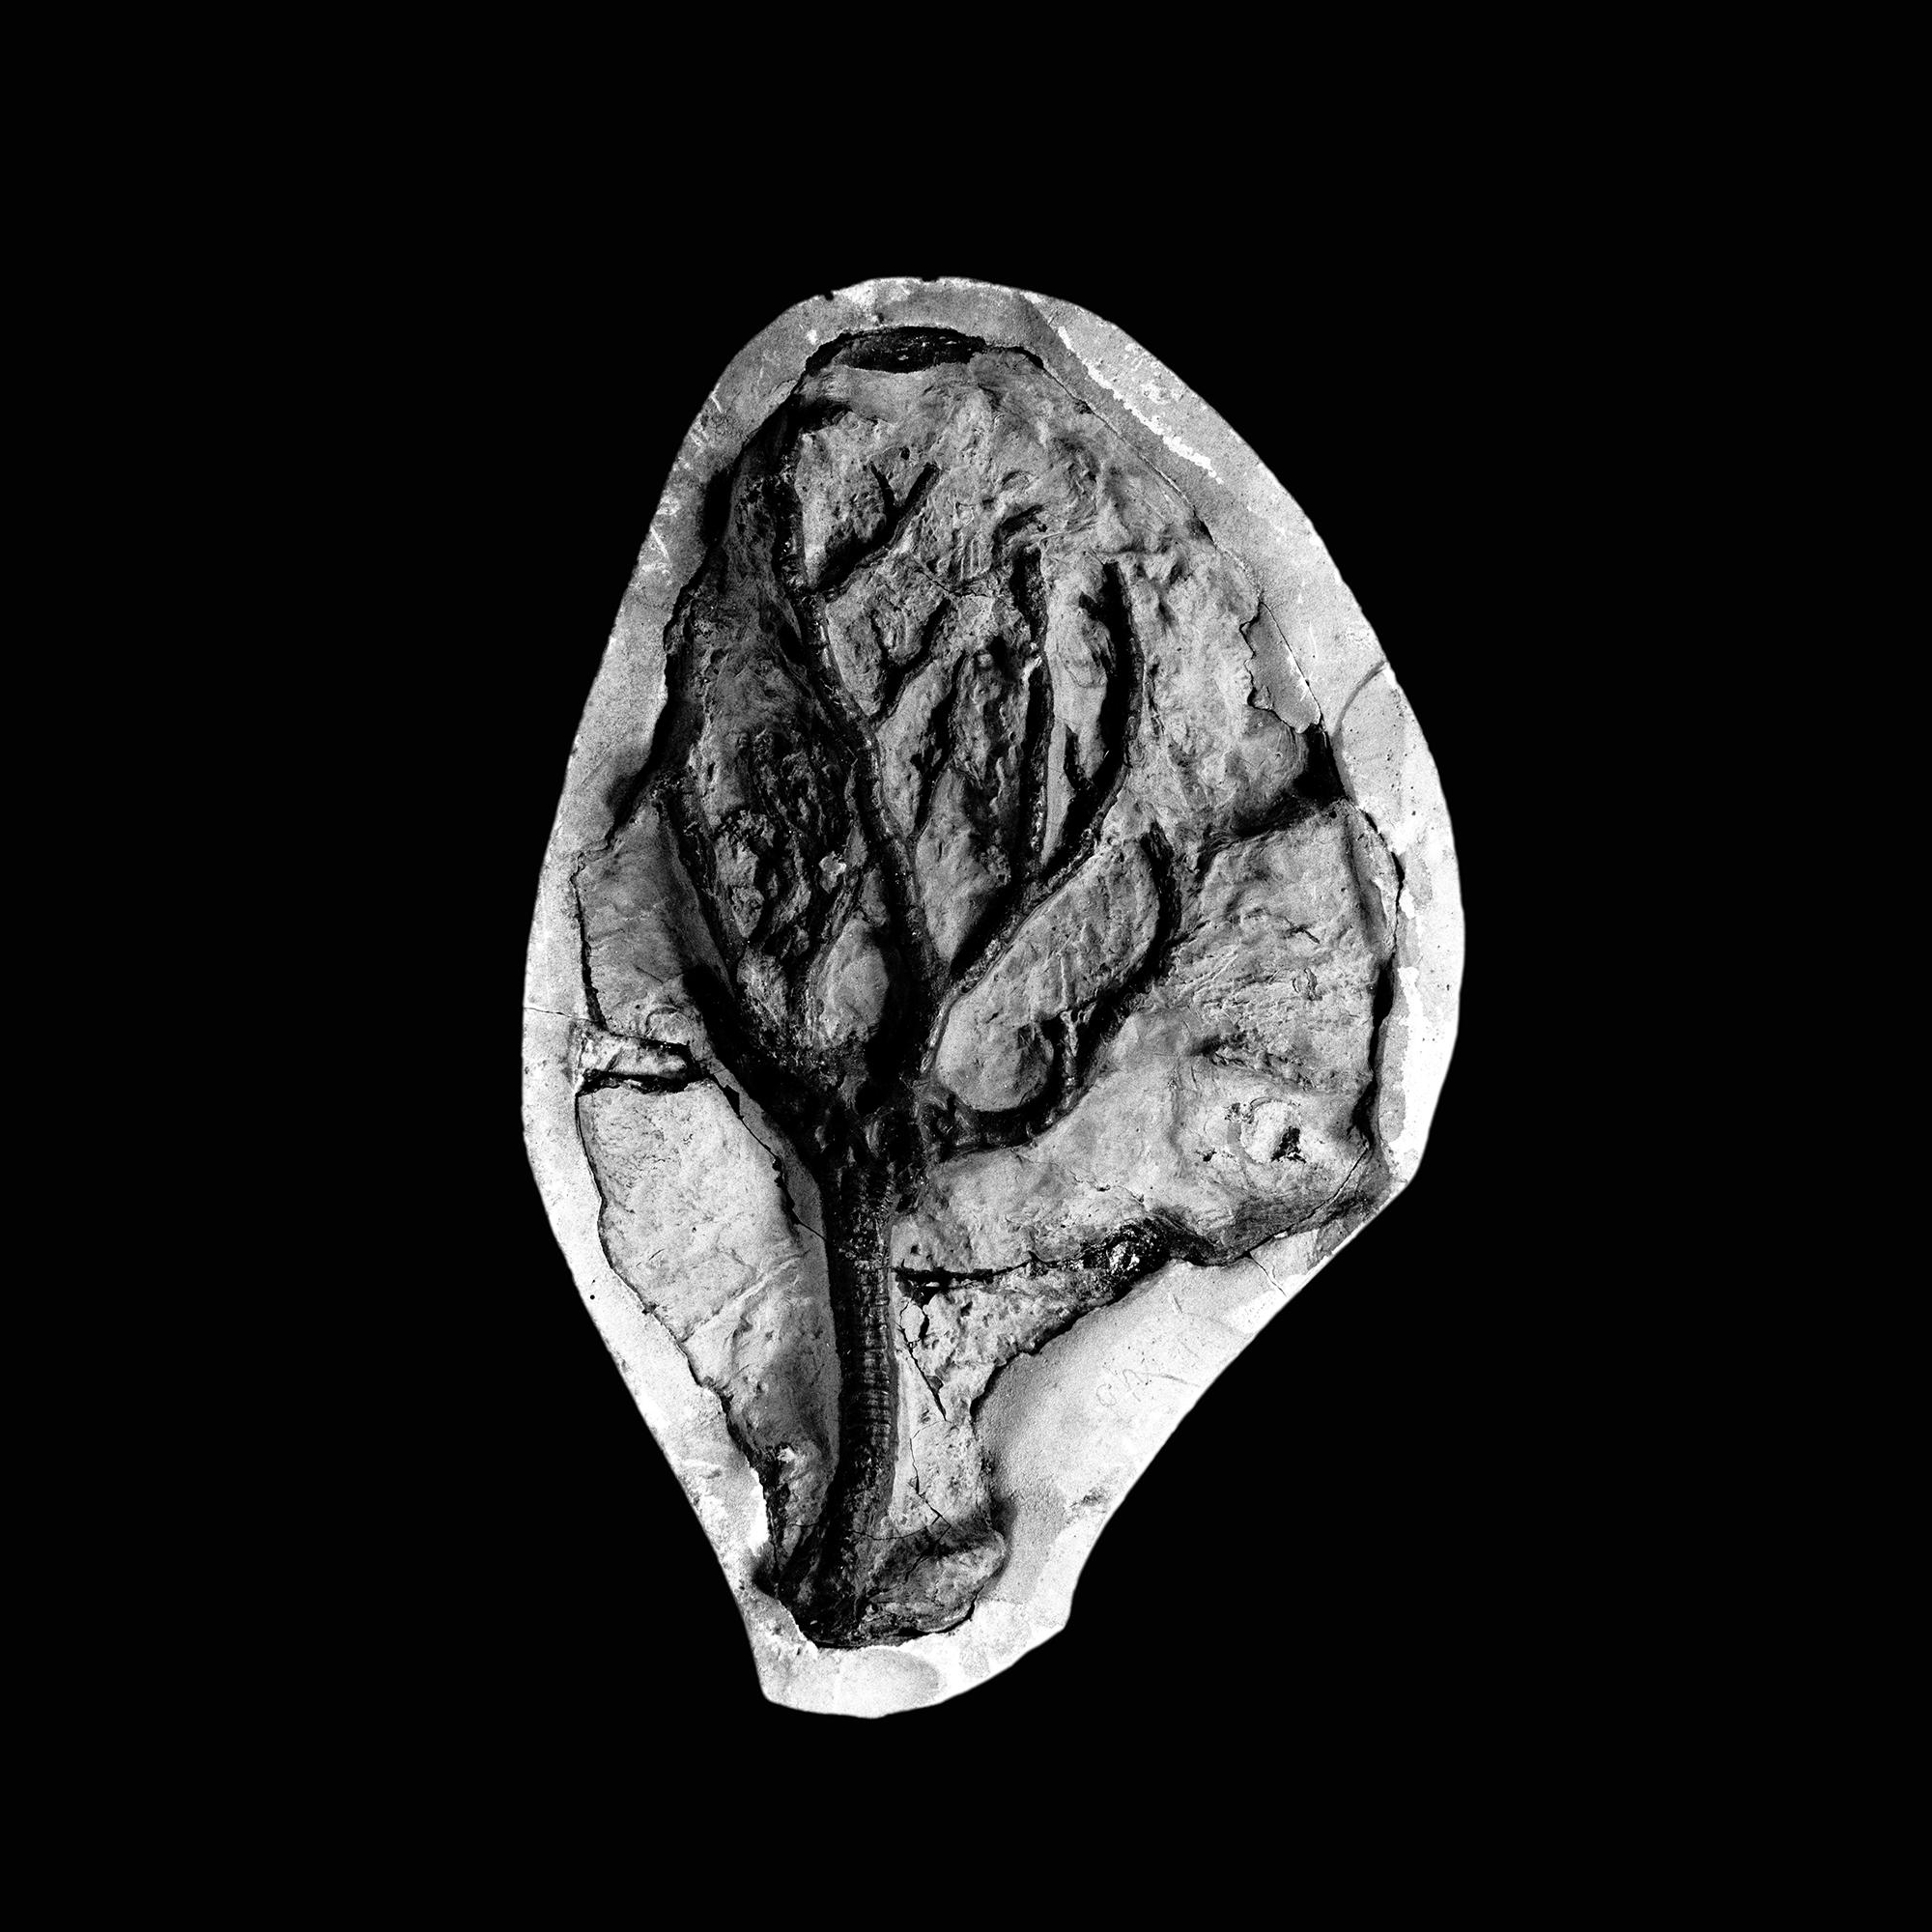 Botyocrinus irregularis, Haarmann